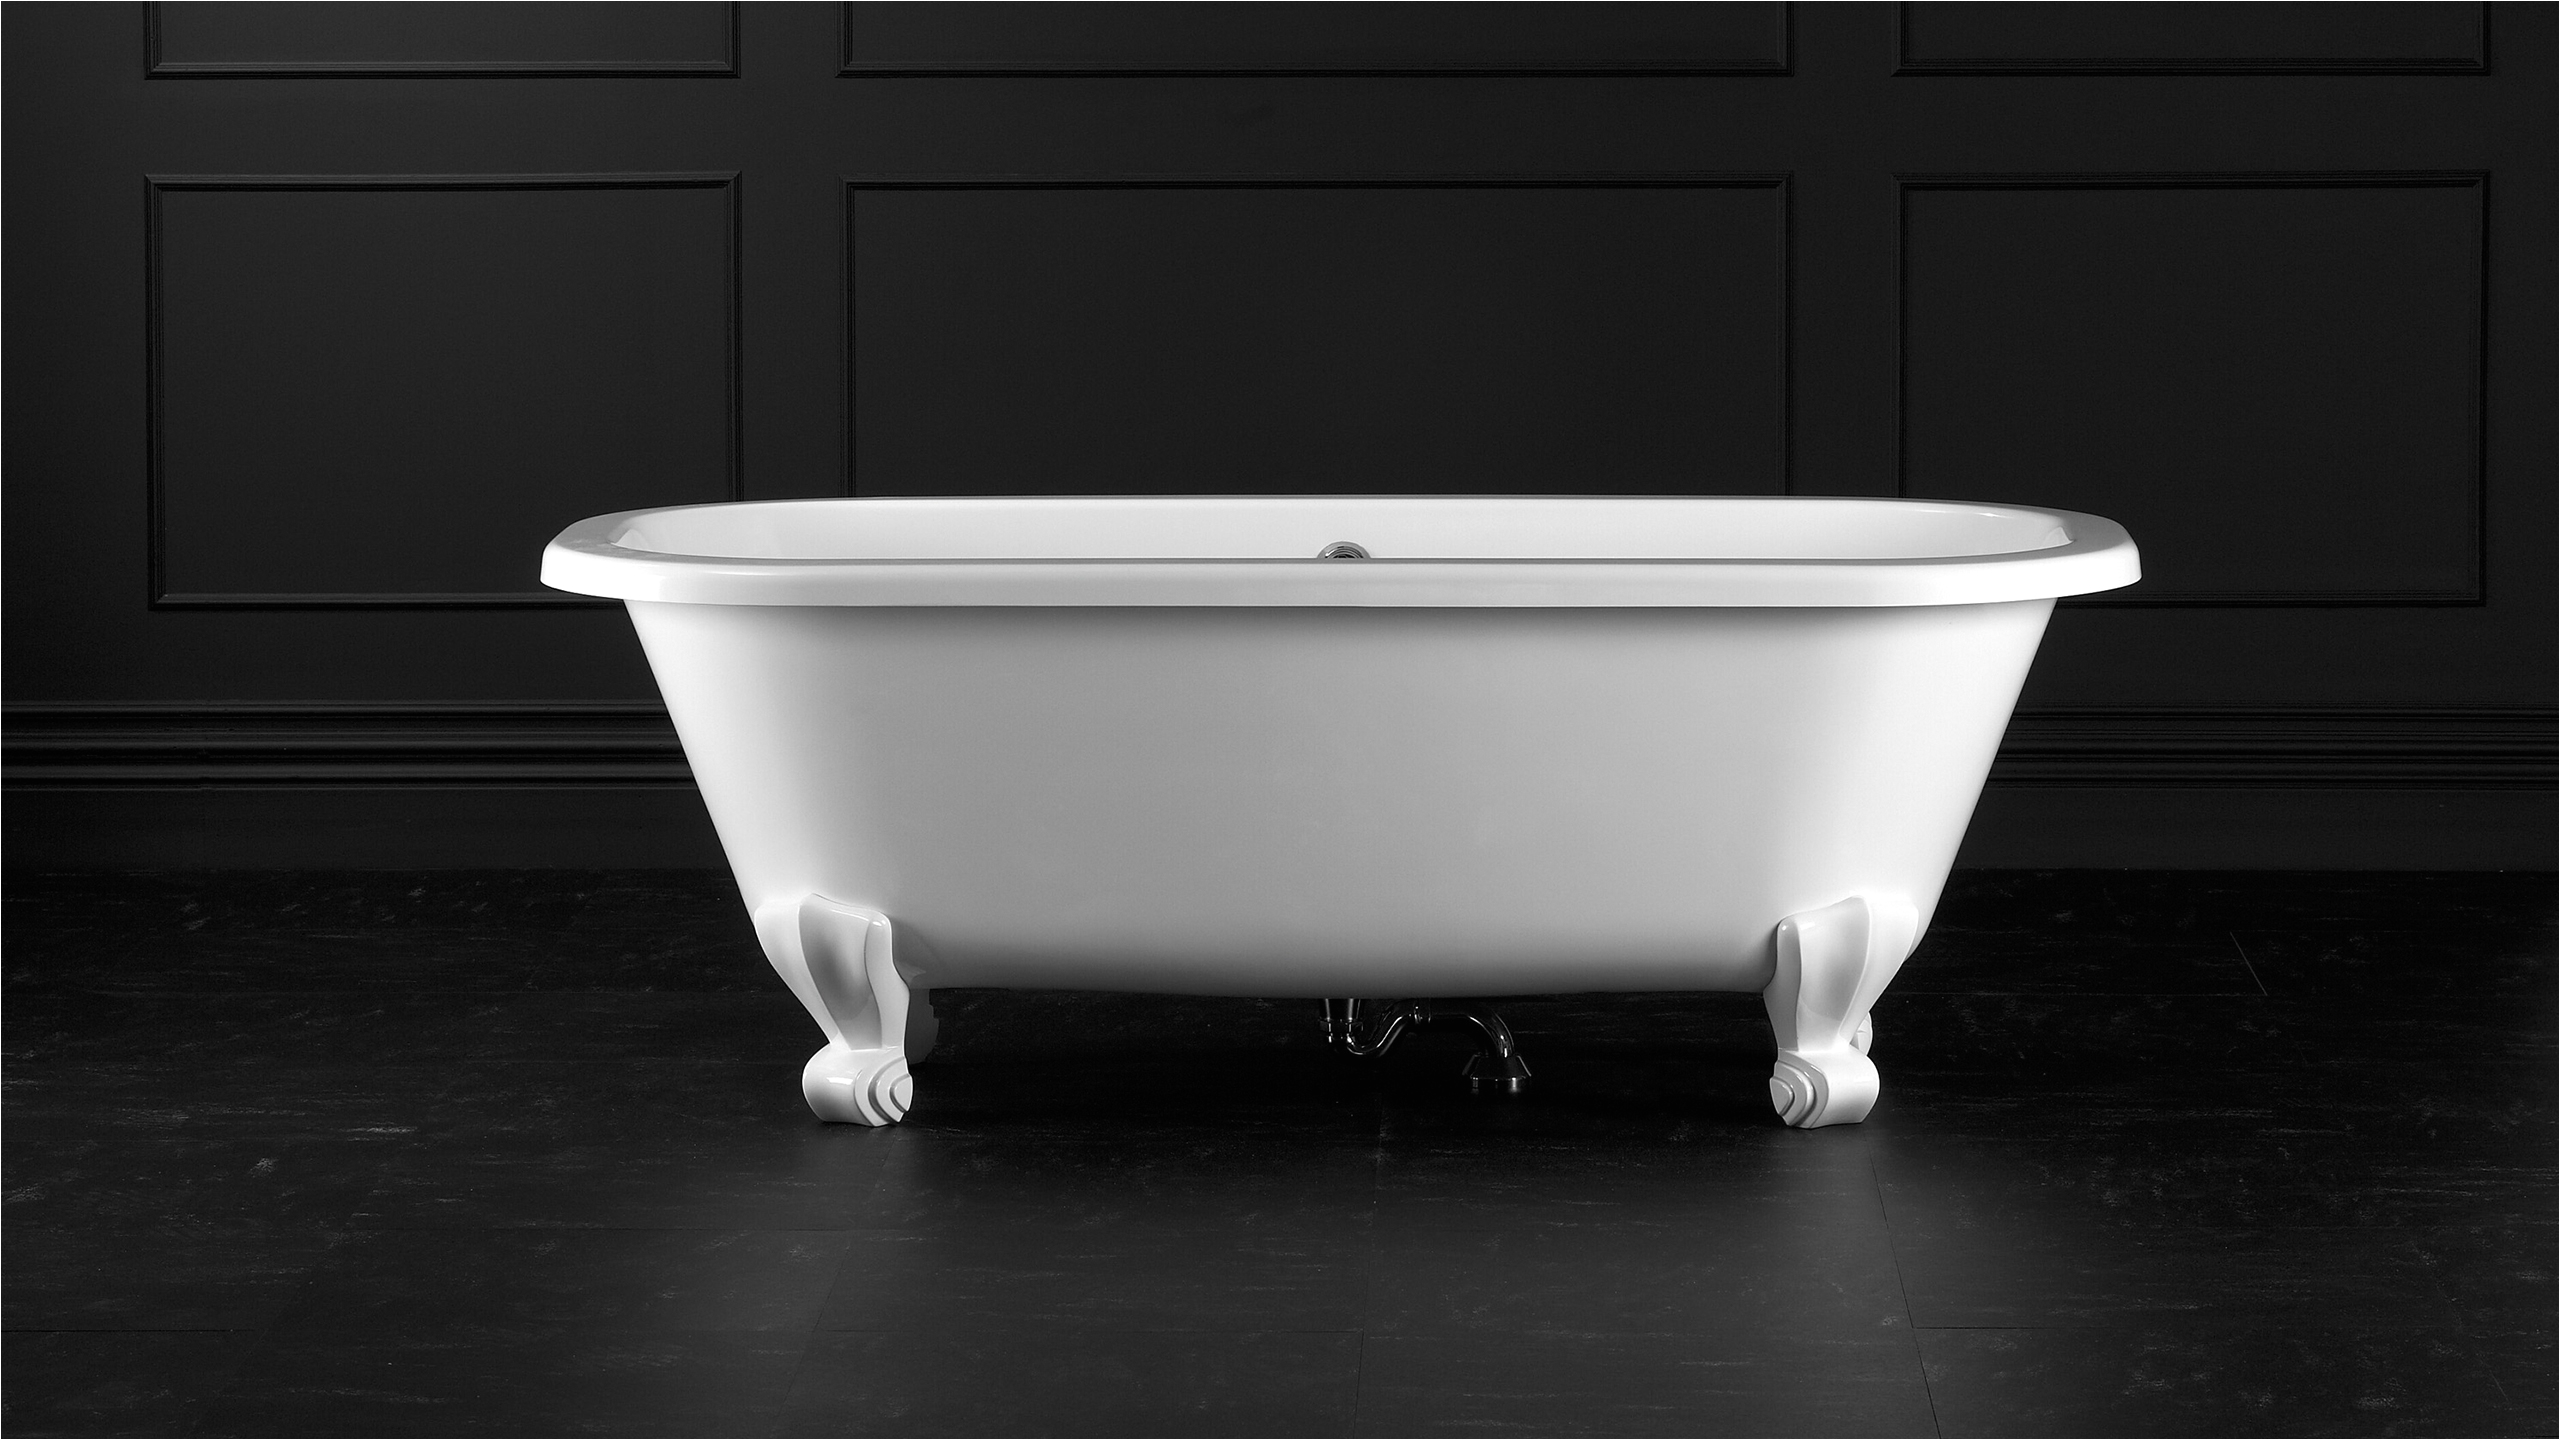 Victoria and Albert Bathtubs Richmond Roll top Clawfoot Tub Victoria Albert Baths Usa